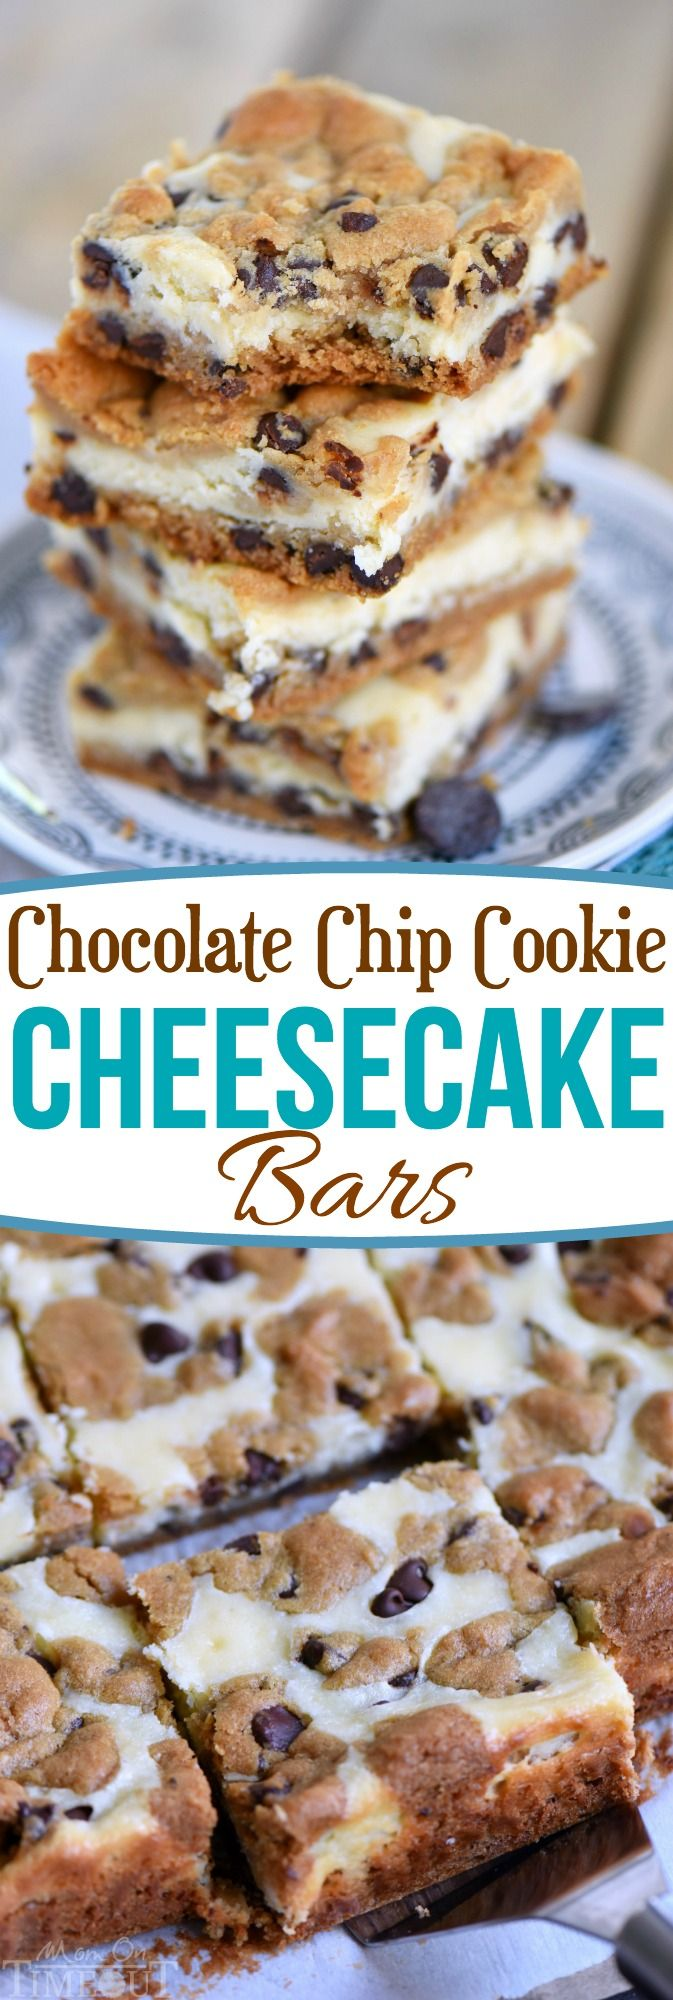 Easy chocolate chip dessert recipes